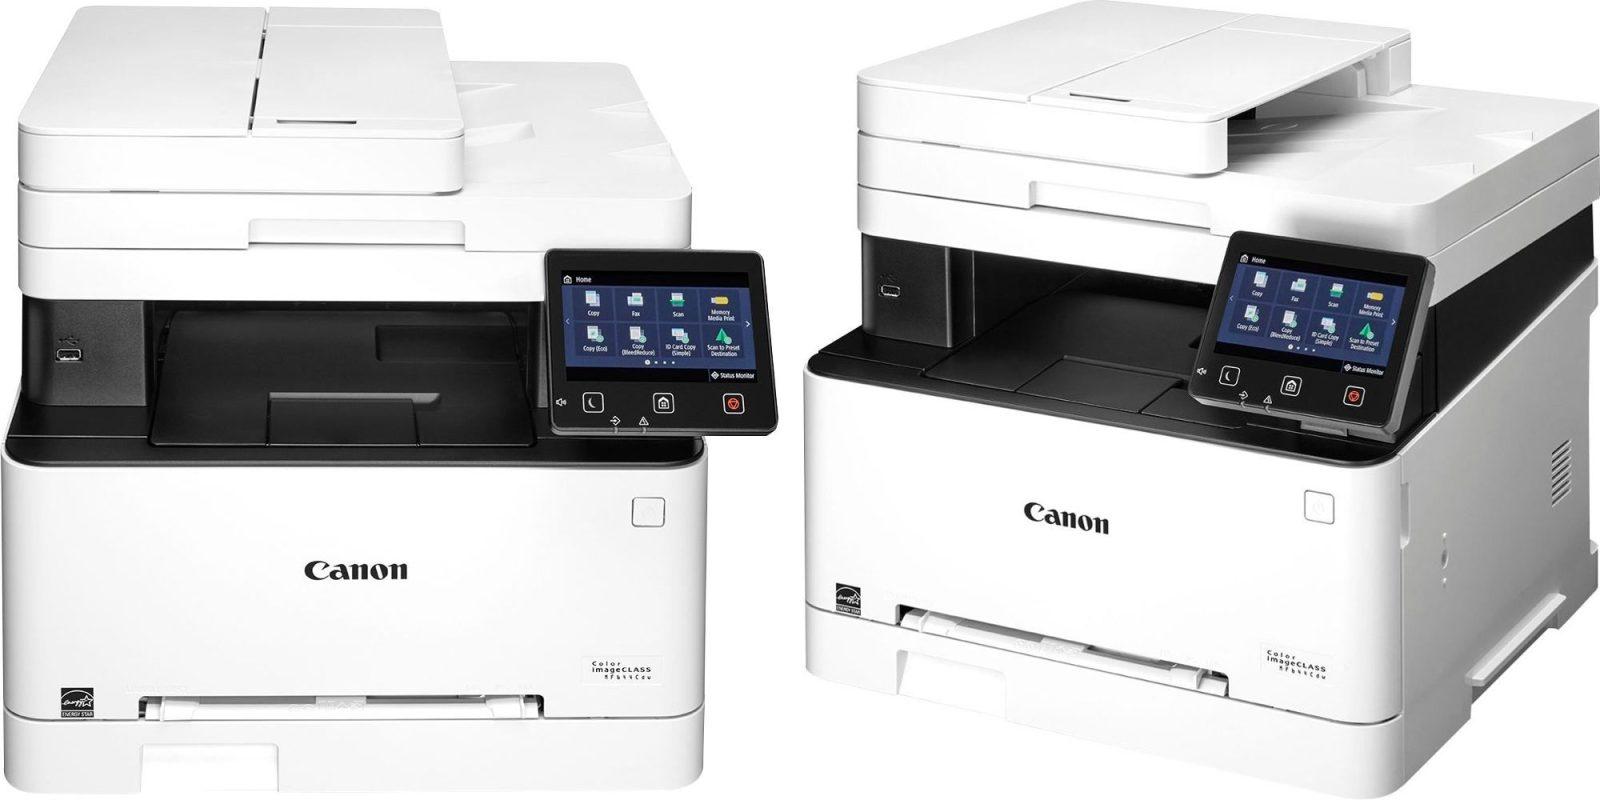 Canon's color laser AiO has AirPrint & Google Cloud Print for $225 (Reg. $300)